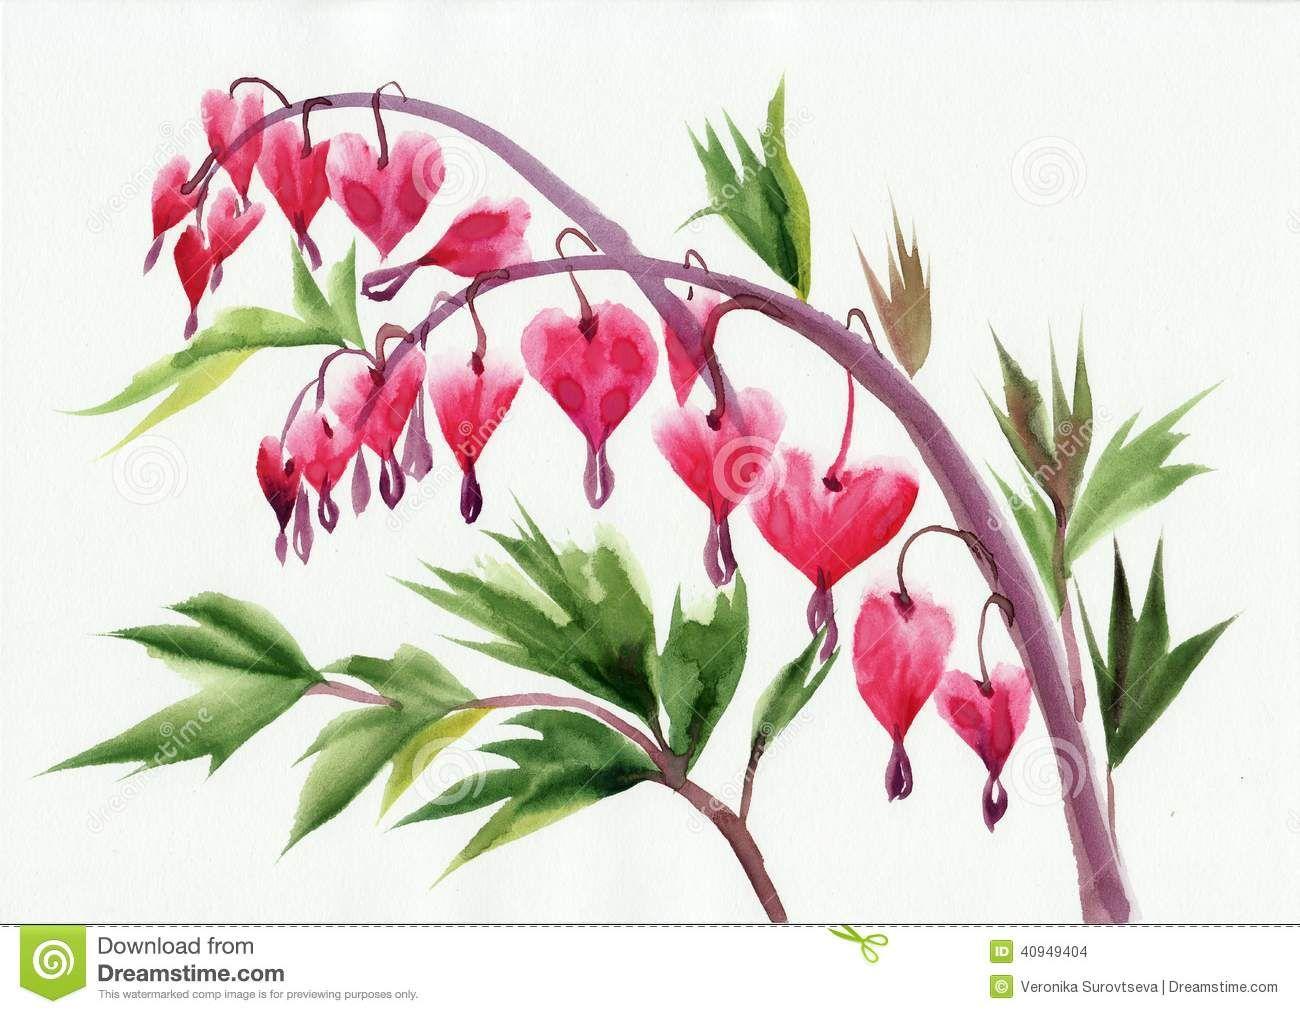 Bleeding Heart Flower Tattoo Watercolor original style